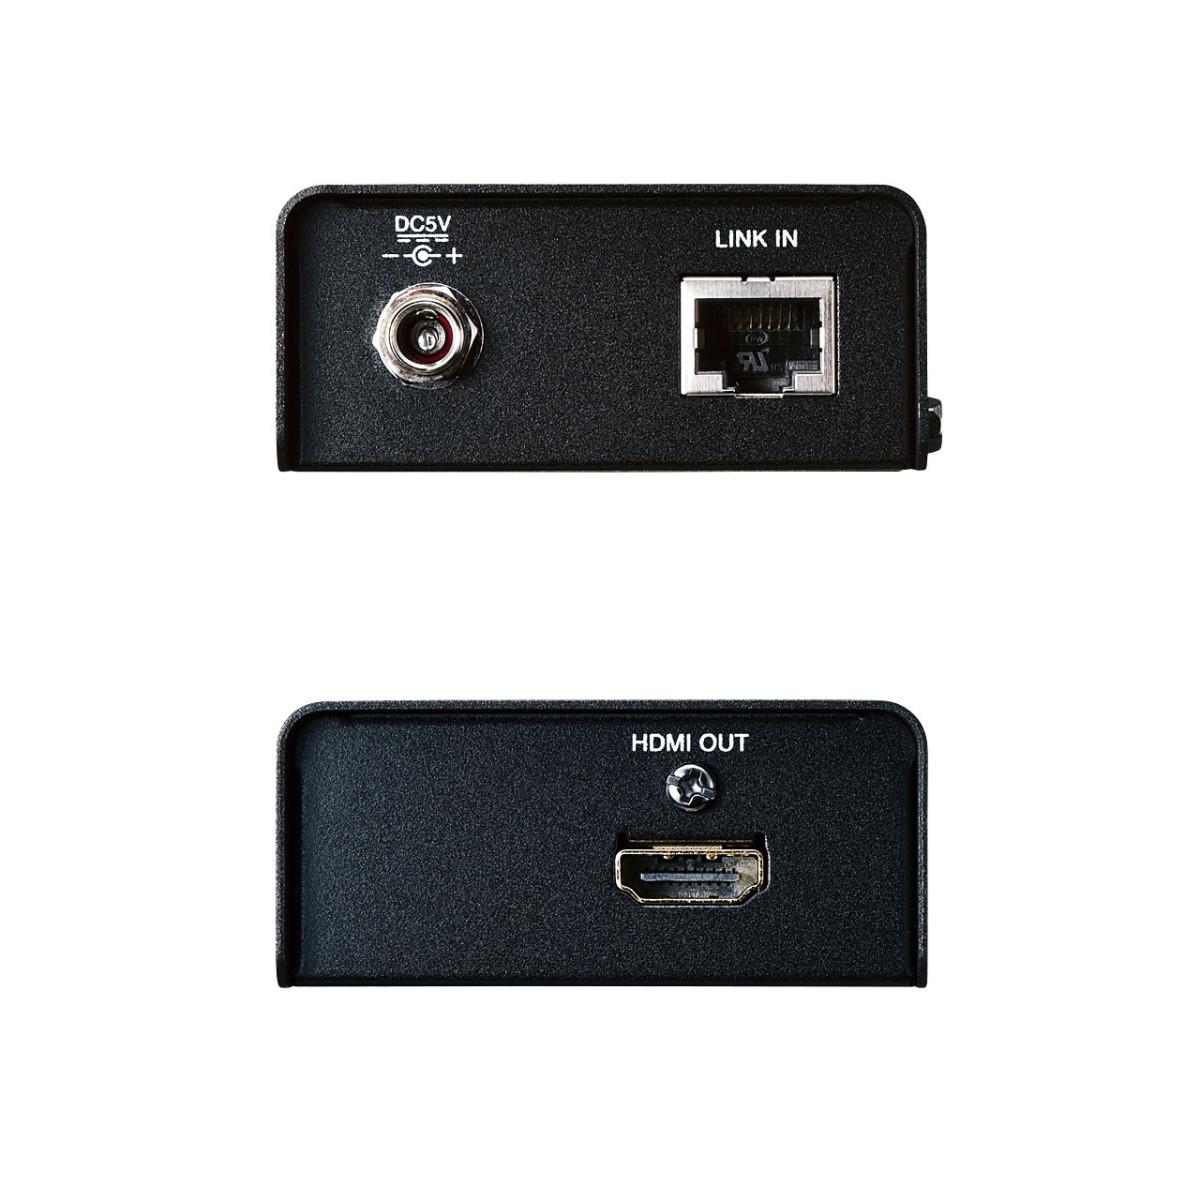 [VGA-EXHDLT] HDMIエクステンダー(セットモデル)